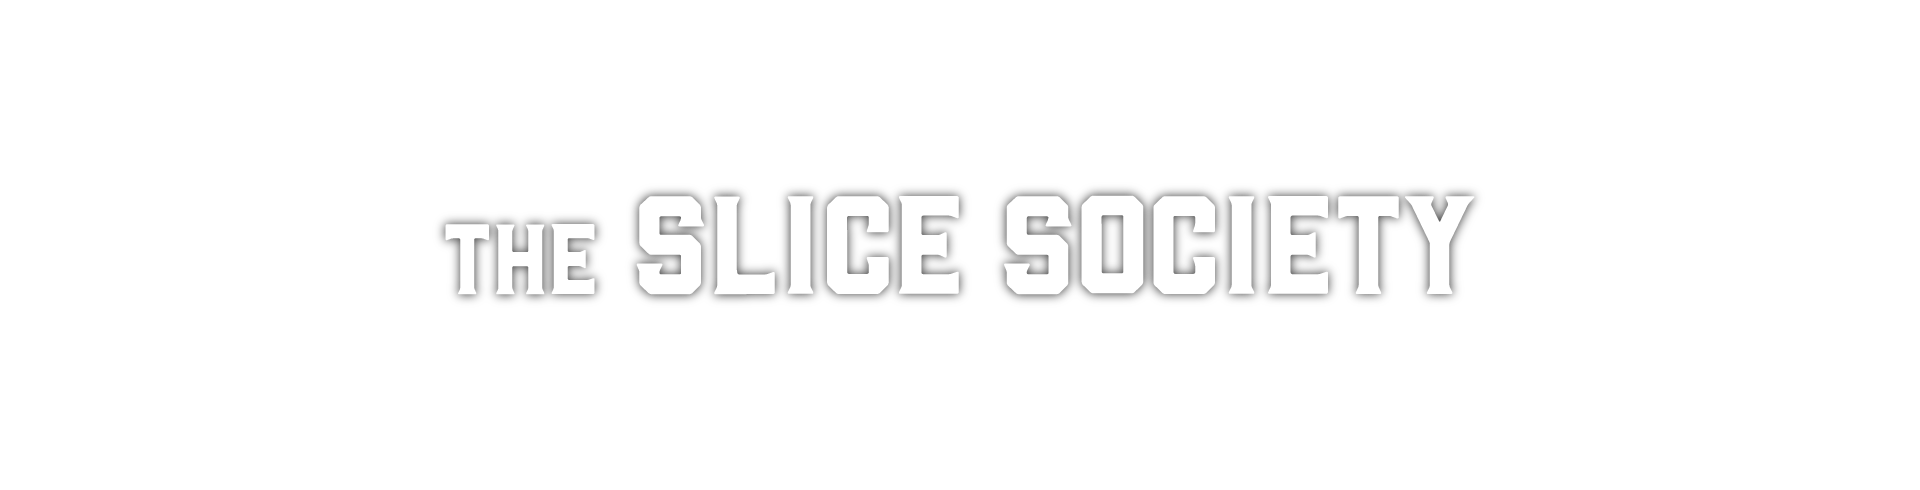 The Slice Society